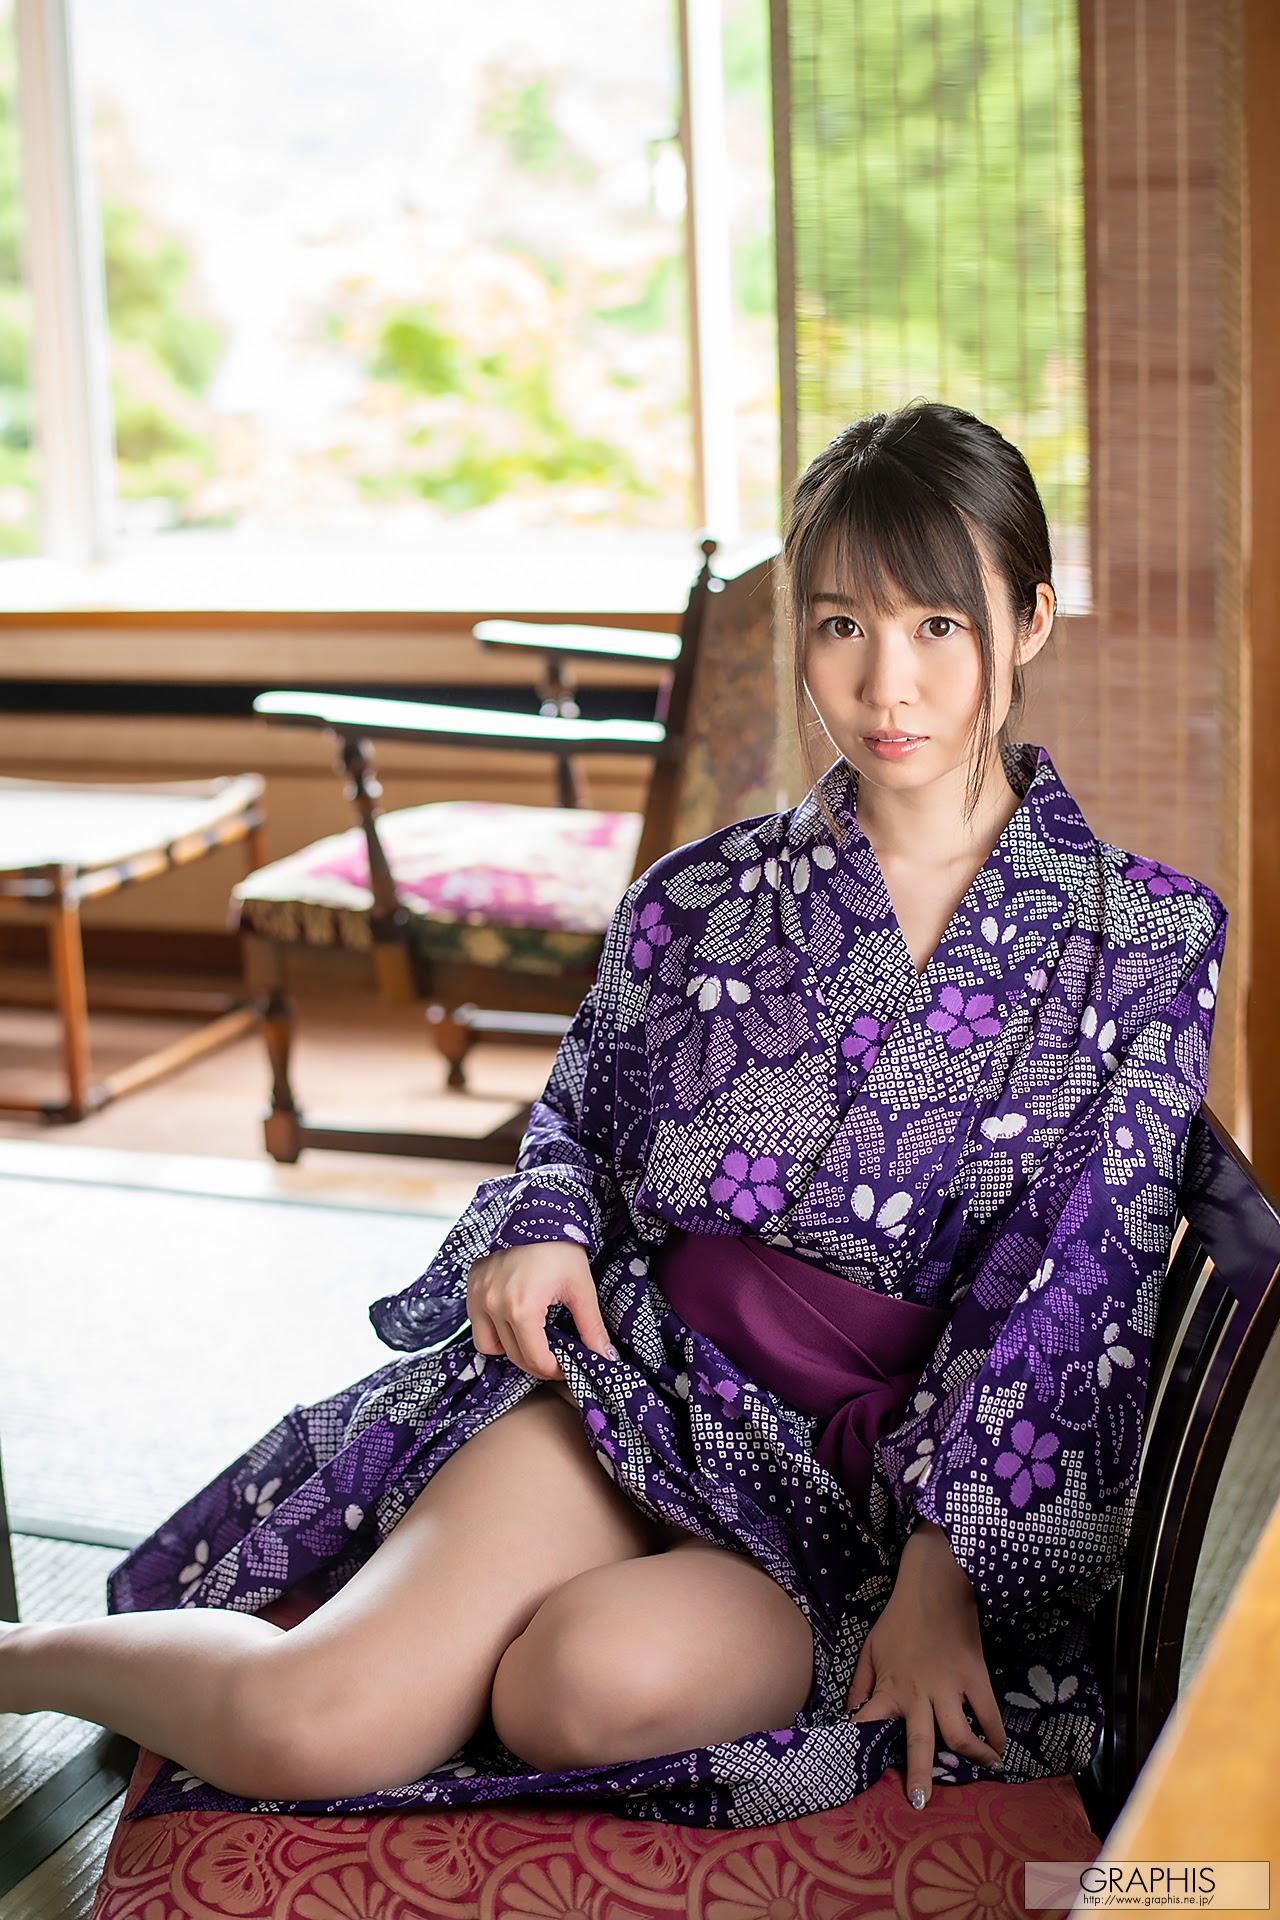 Aika Yumeno 夢乃あいか, [Graphis] Limited Edition 2020.03.27